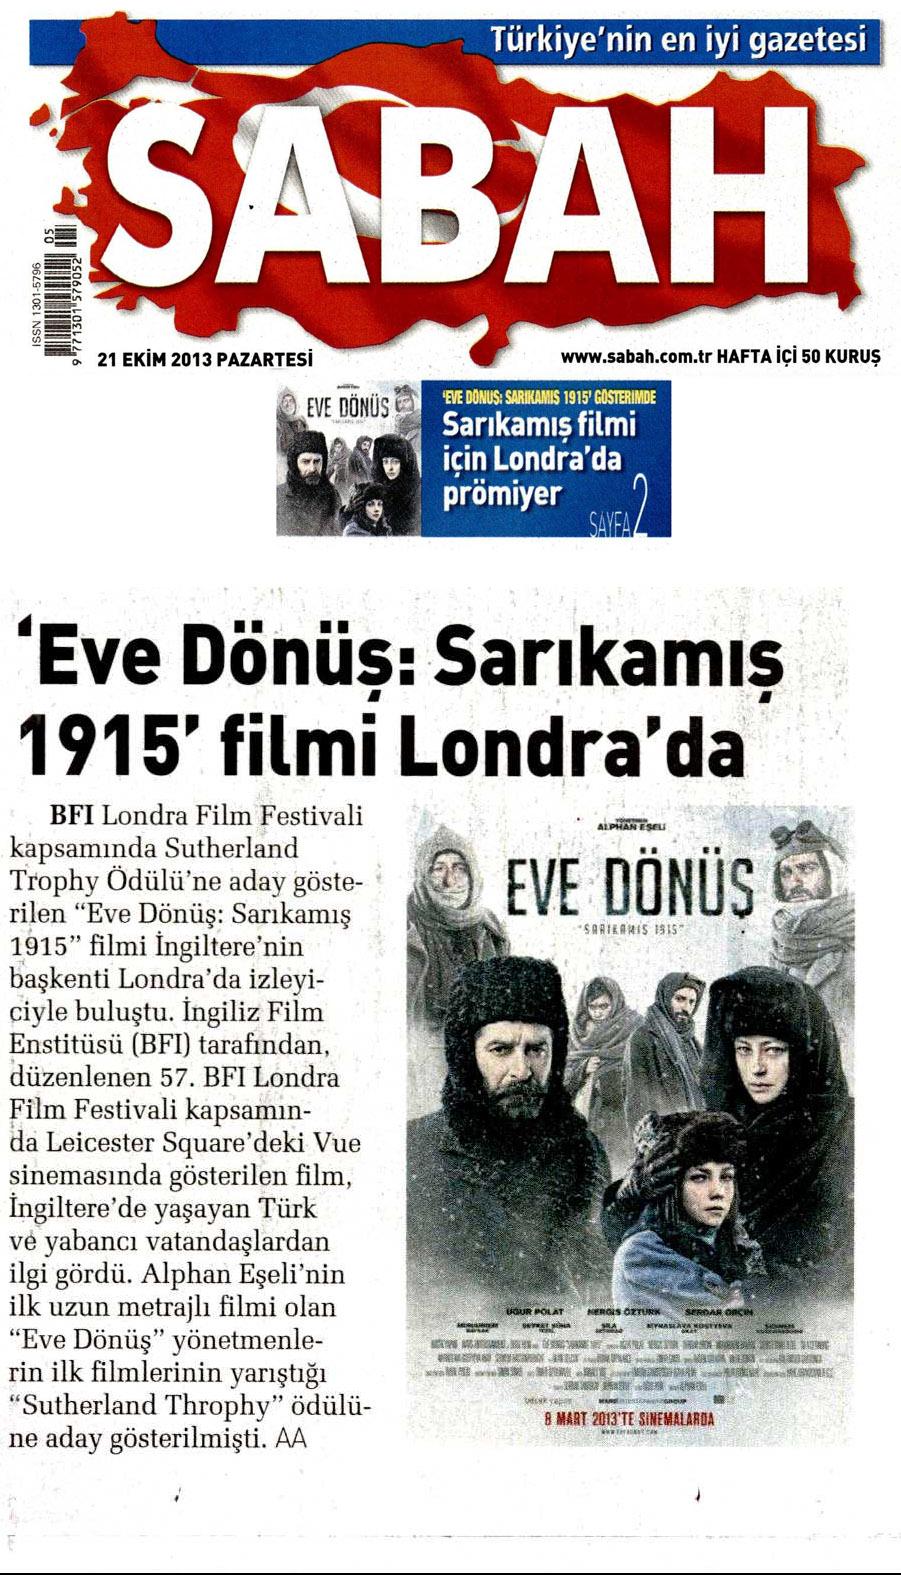 Sabah Newspaper Turkey